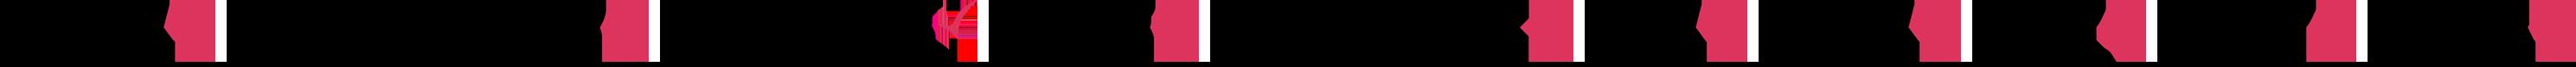 Sertifikācija un Licencēšana logo | Cilmes šūnu banku alianse | LYL BioBank Hearts